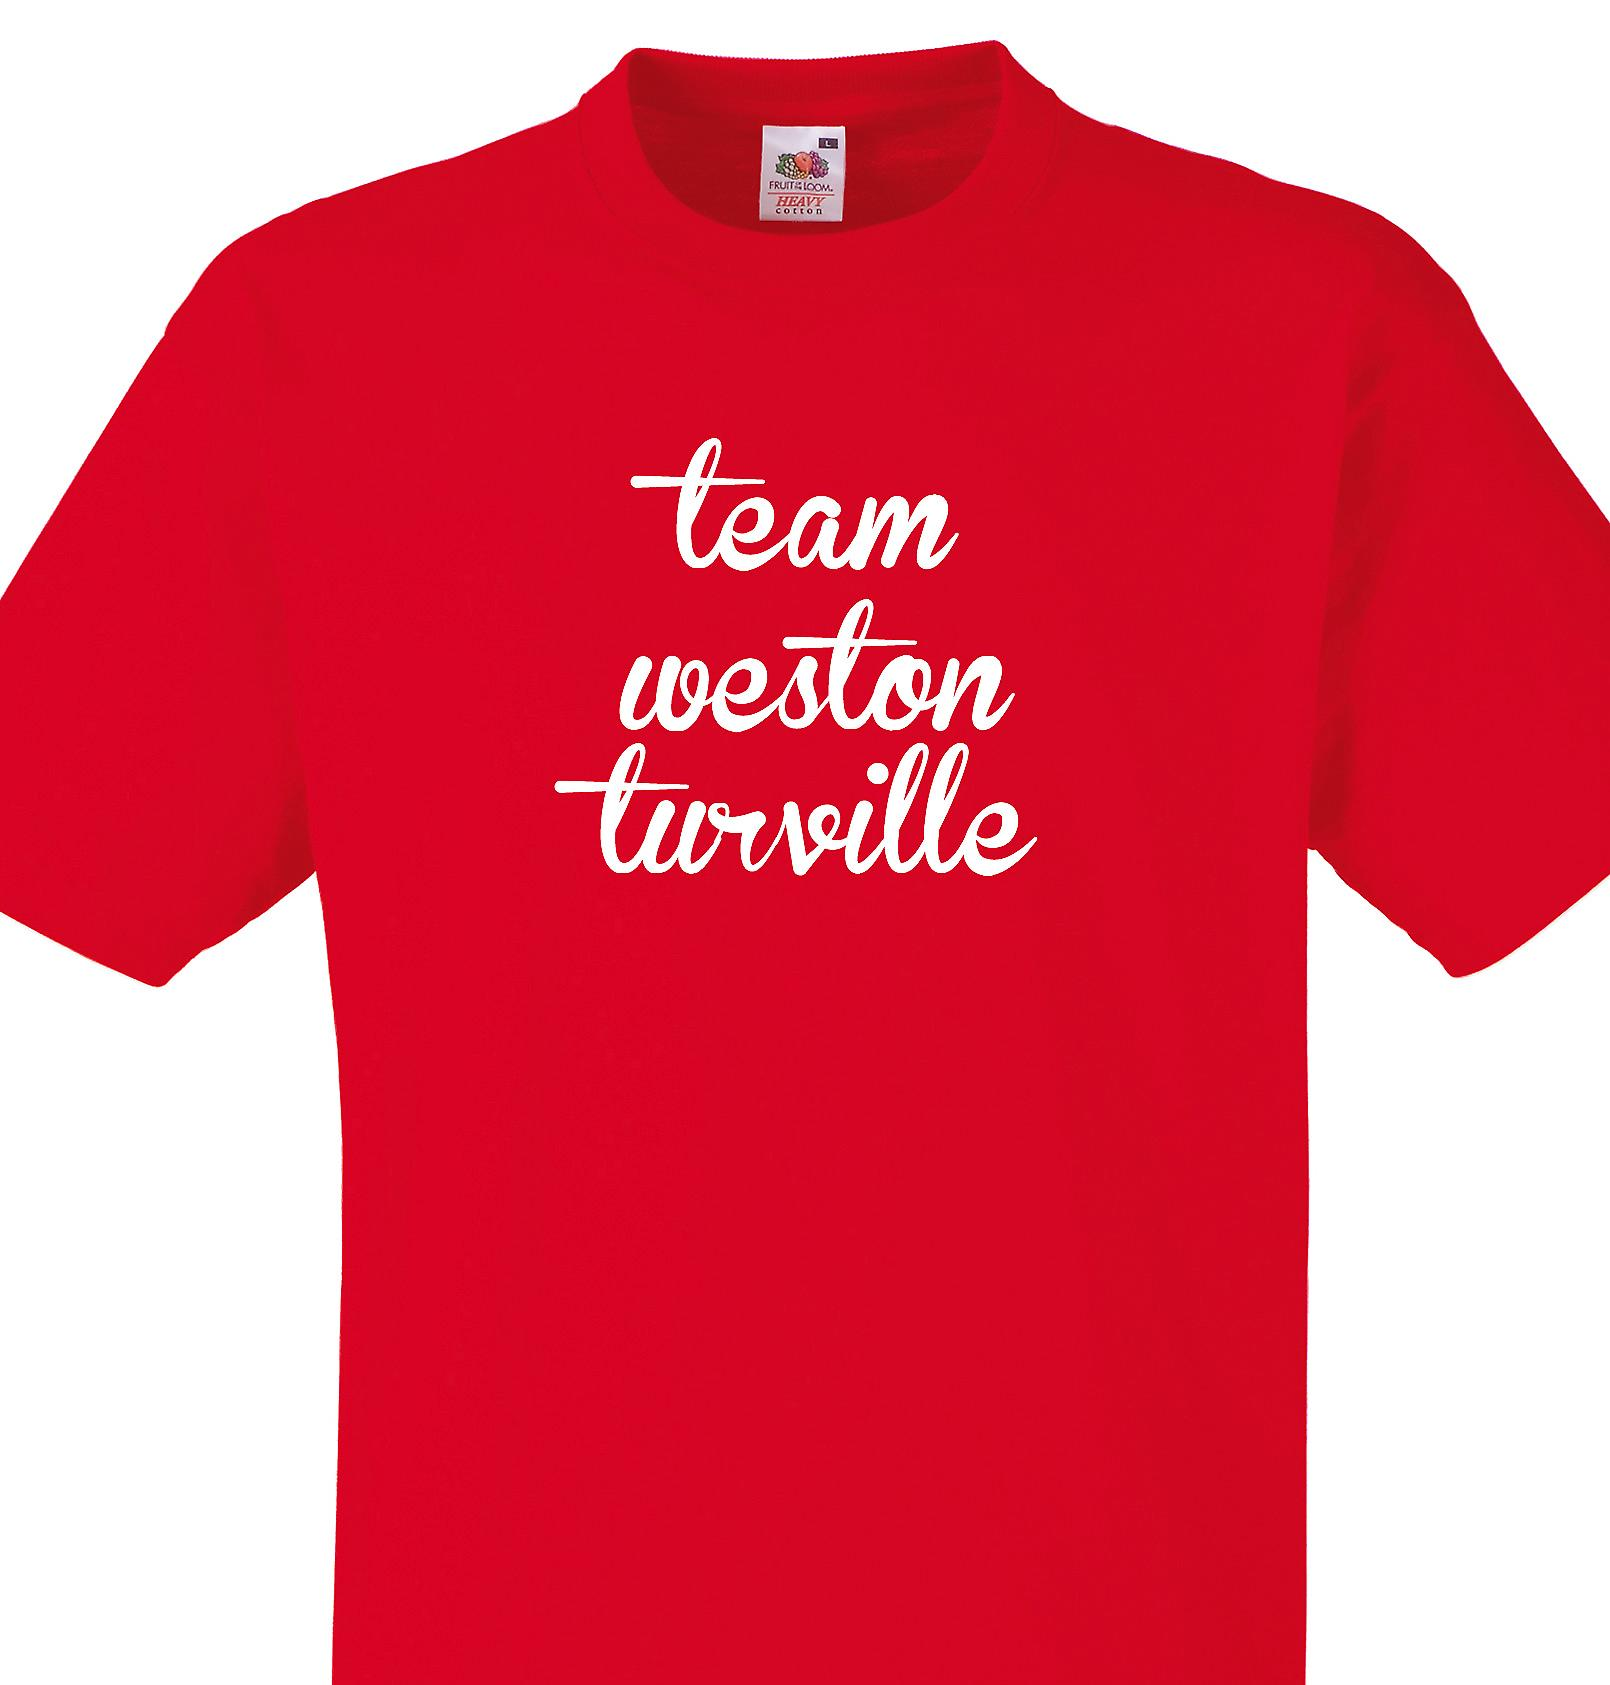 Team Weston turville Red T shirt